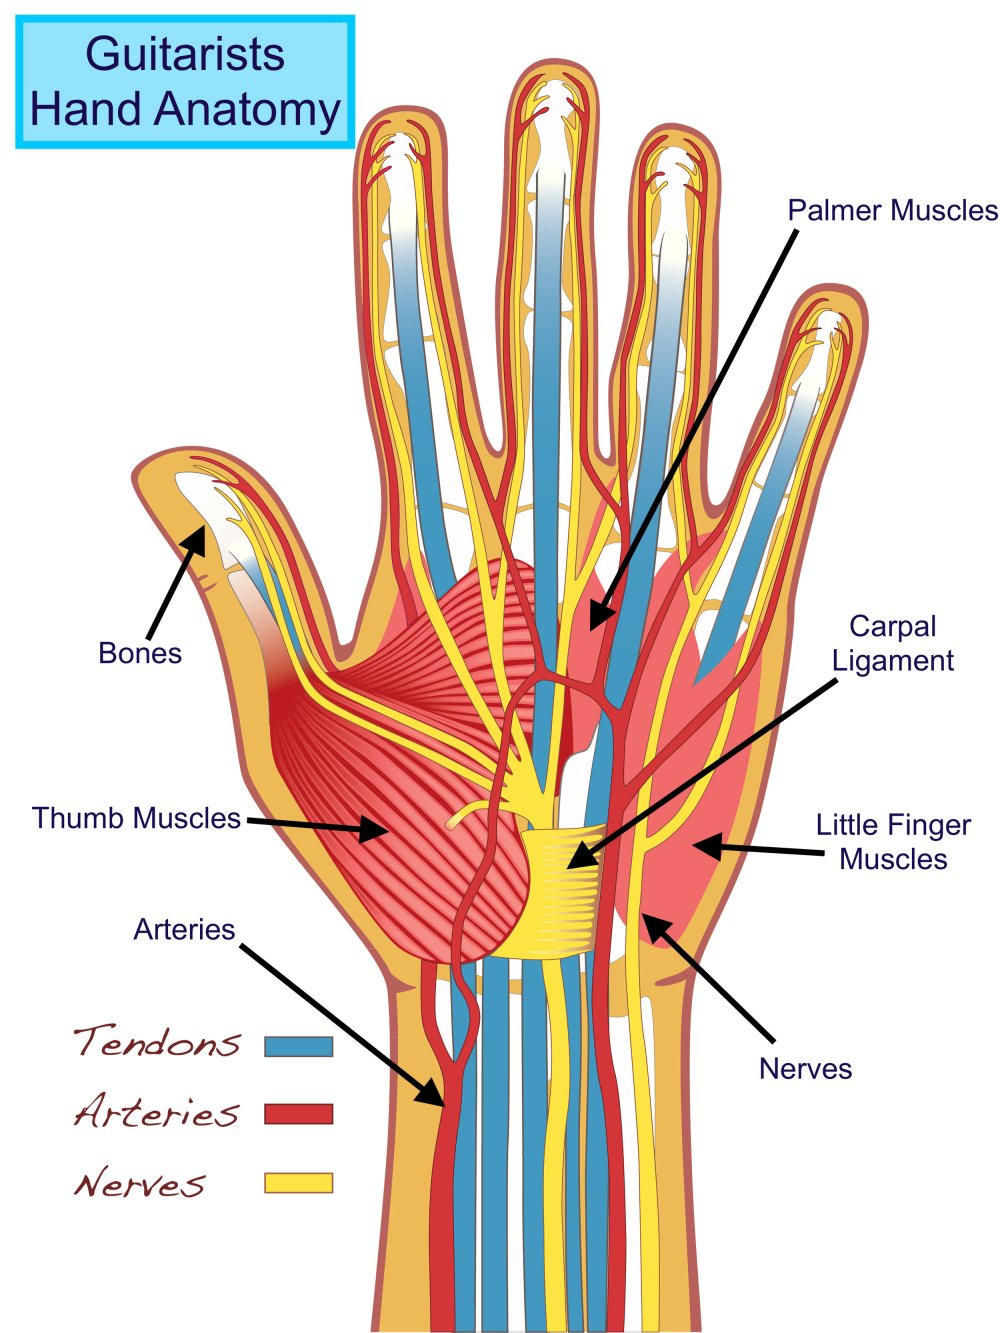 medium resolution of hand anatomy u2014 tuned in guitar lessonsguitarist u0027s hand anatomy